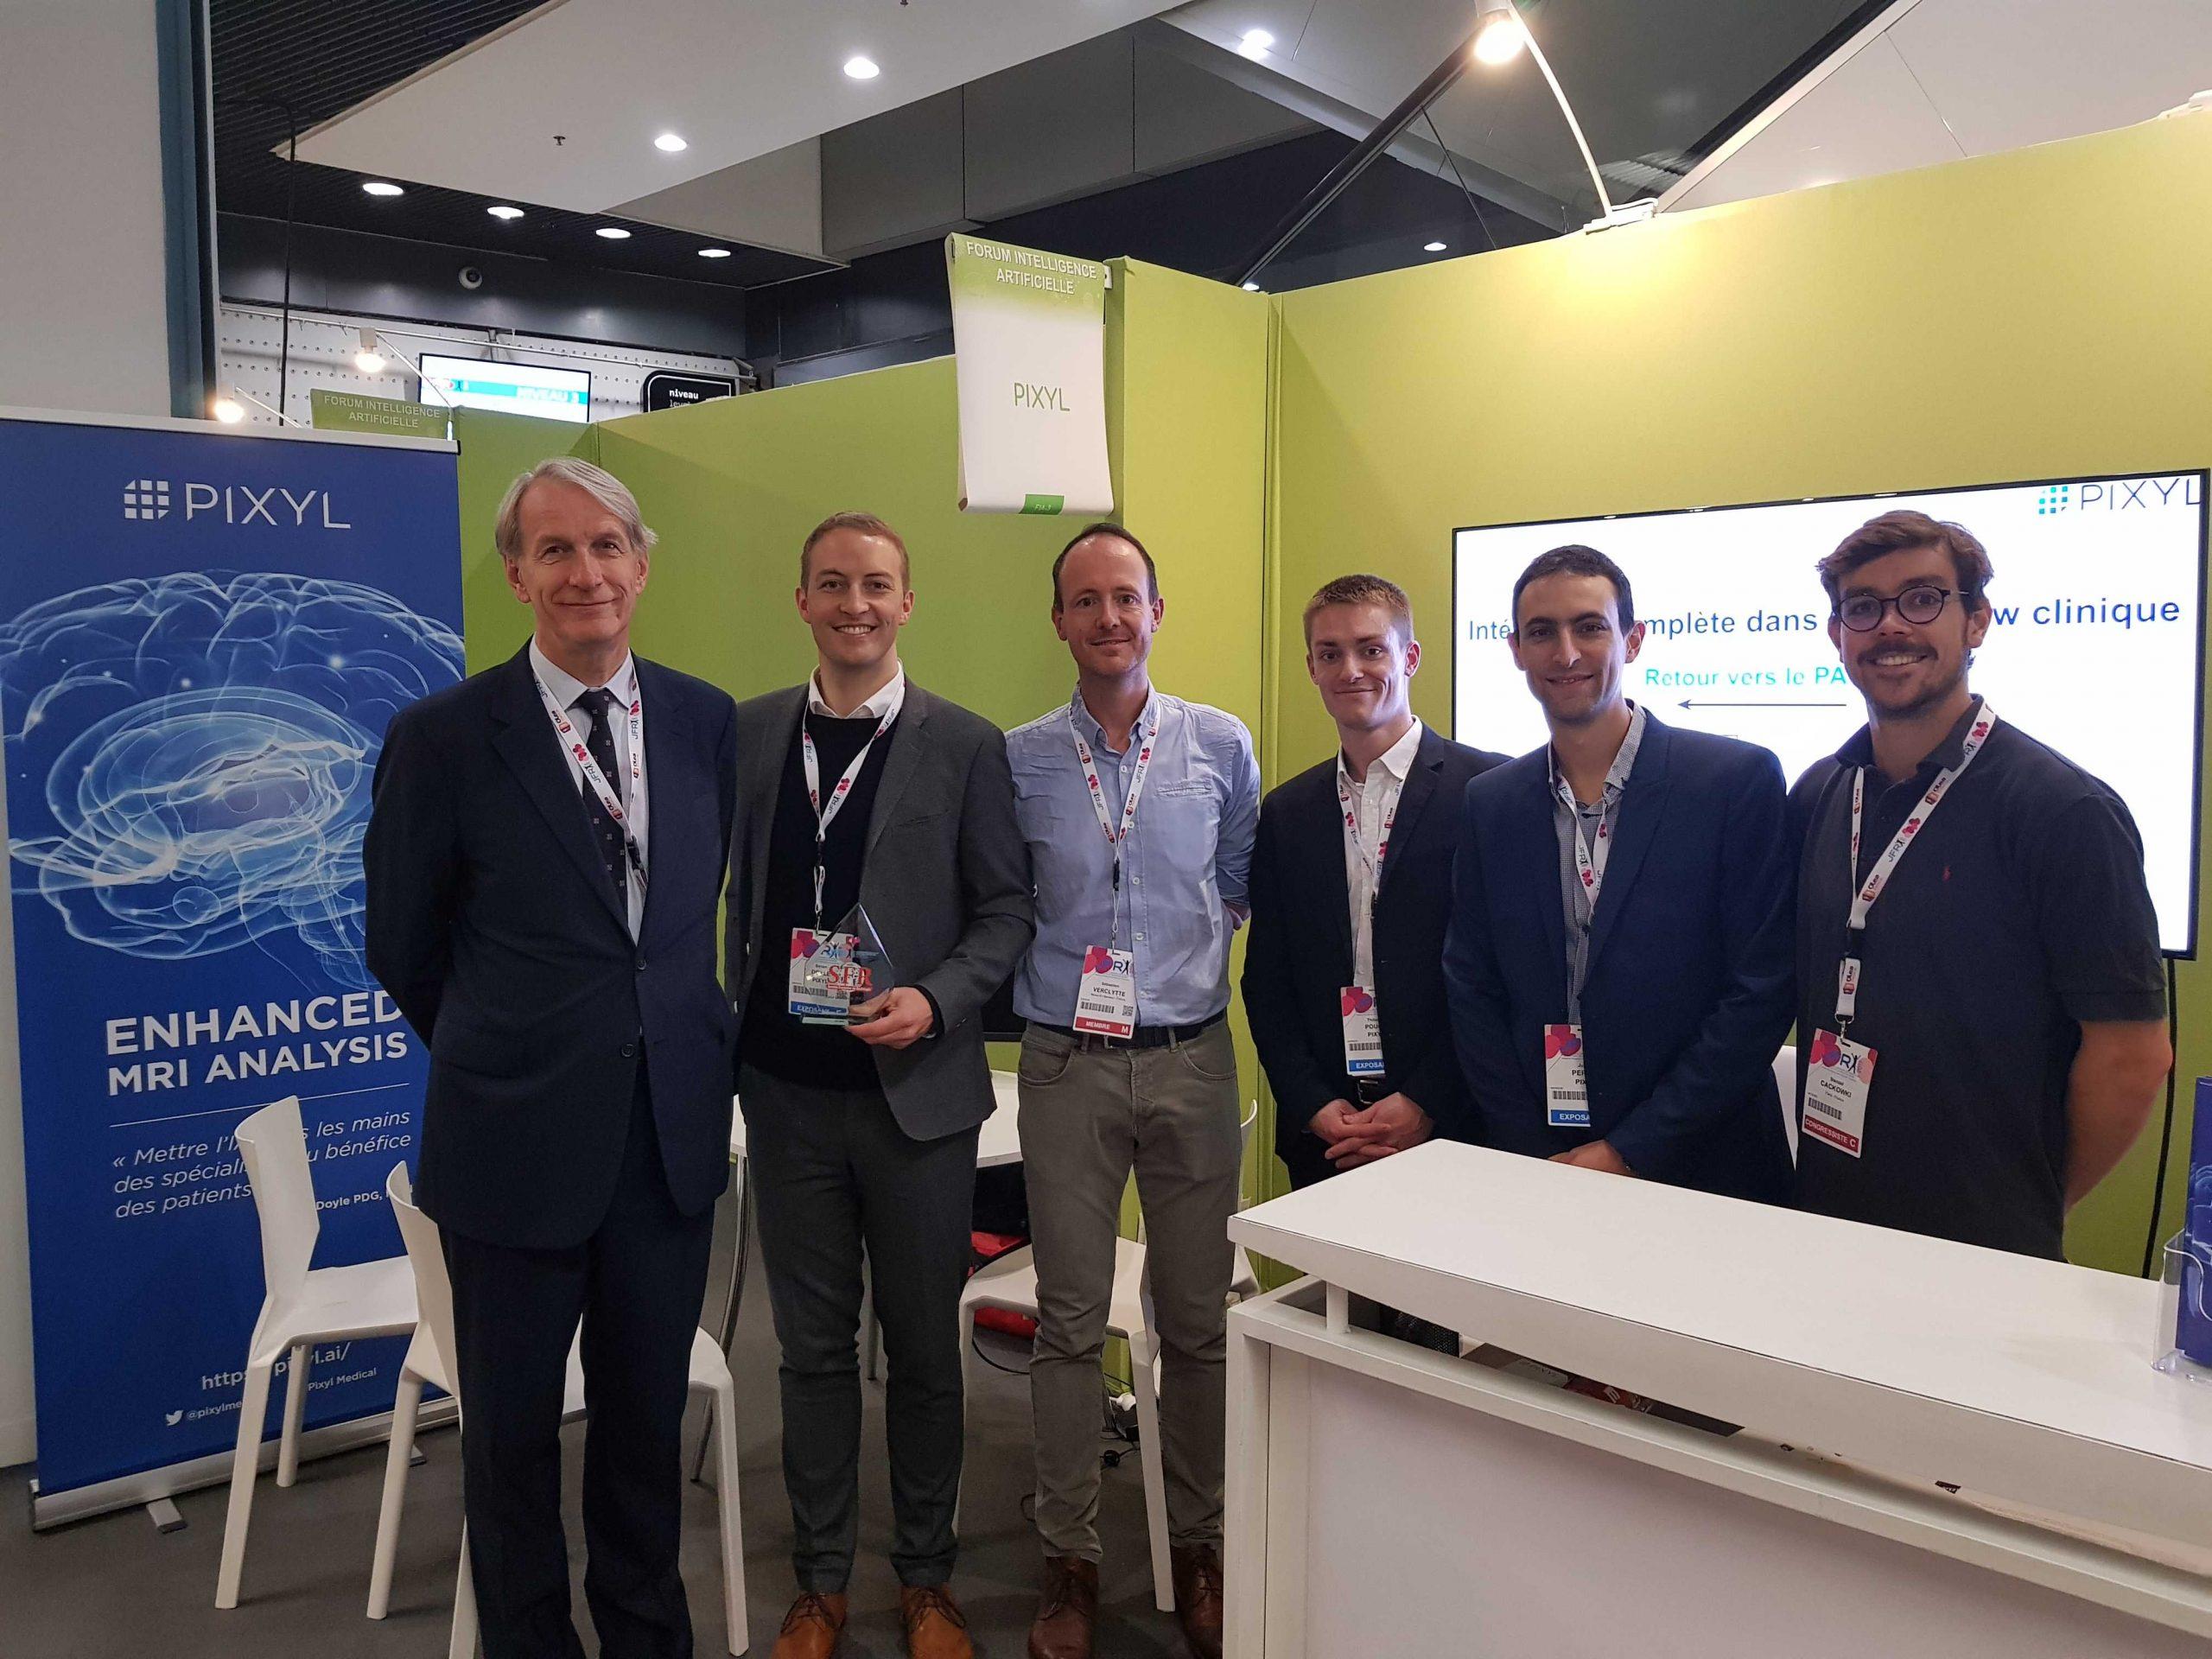 Pixyl wins AI data challenge at JFR 2019